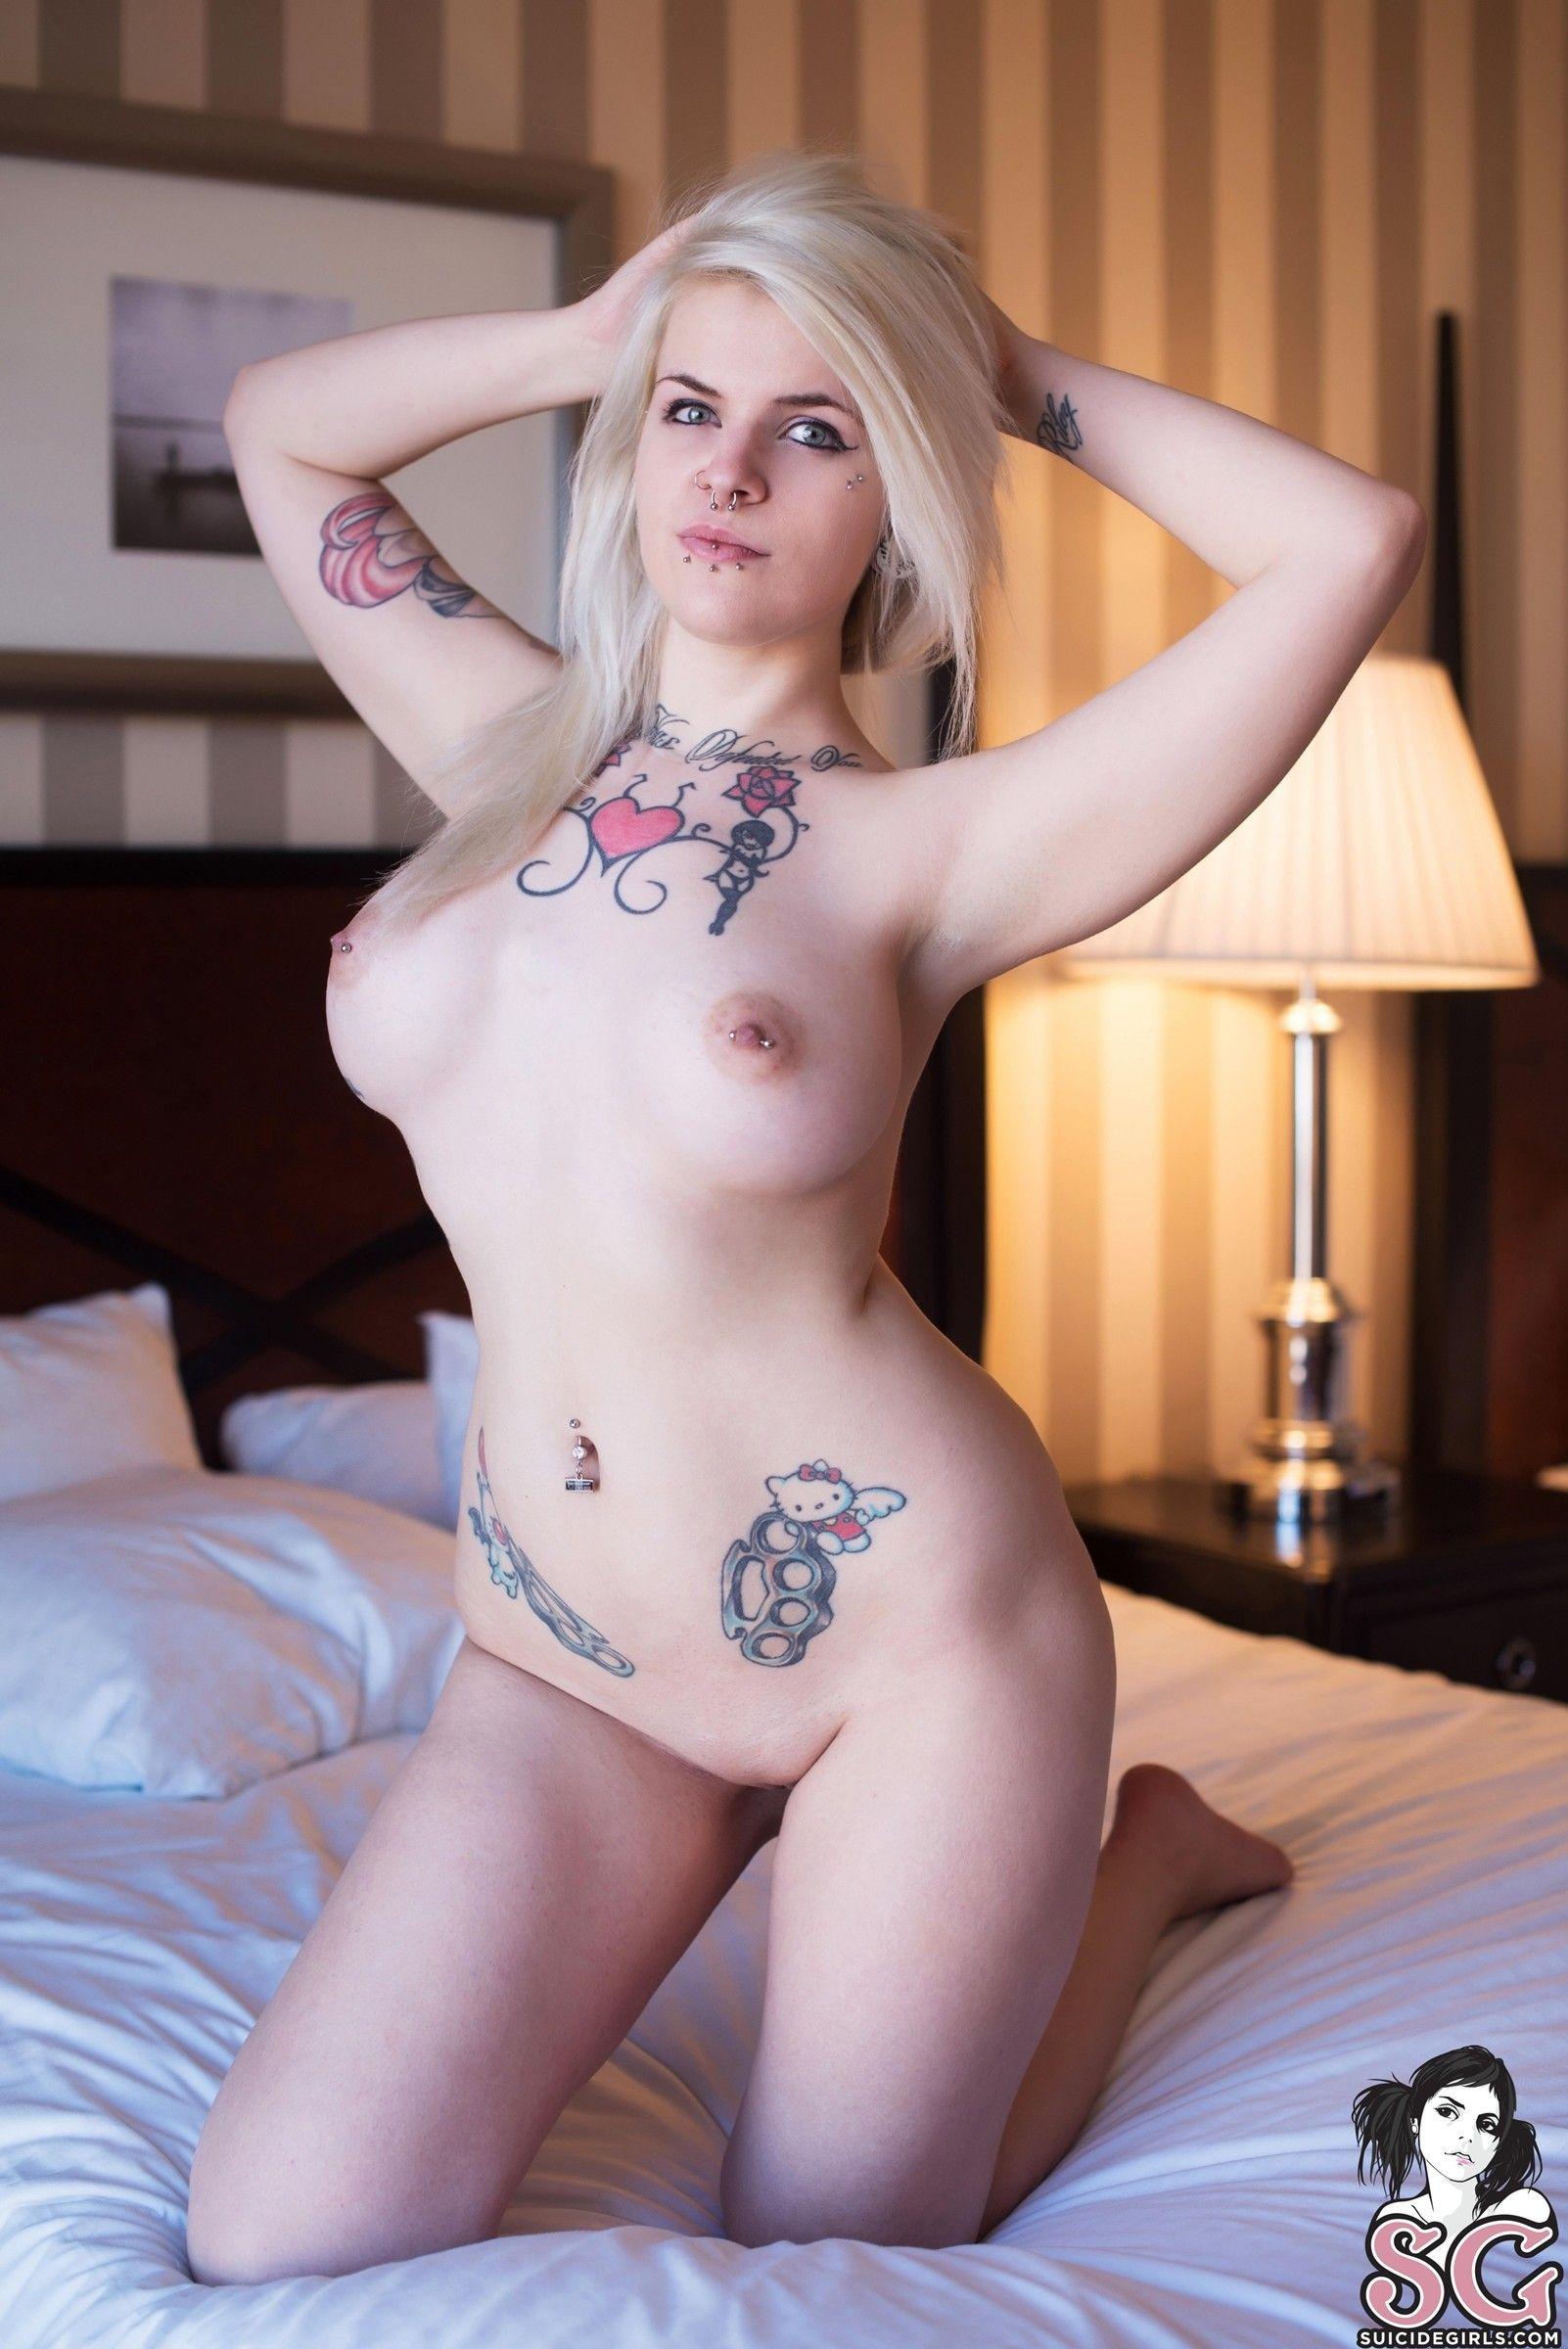 loira tatuada curte um punk rock pelada 1df93365feb4ec6f67897b5c459fd9c1 - Loira tatuada curte um punk rock pelada